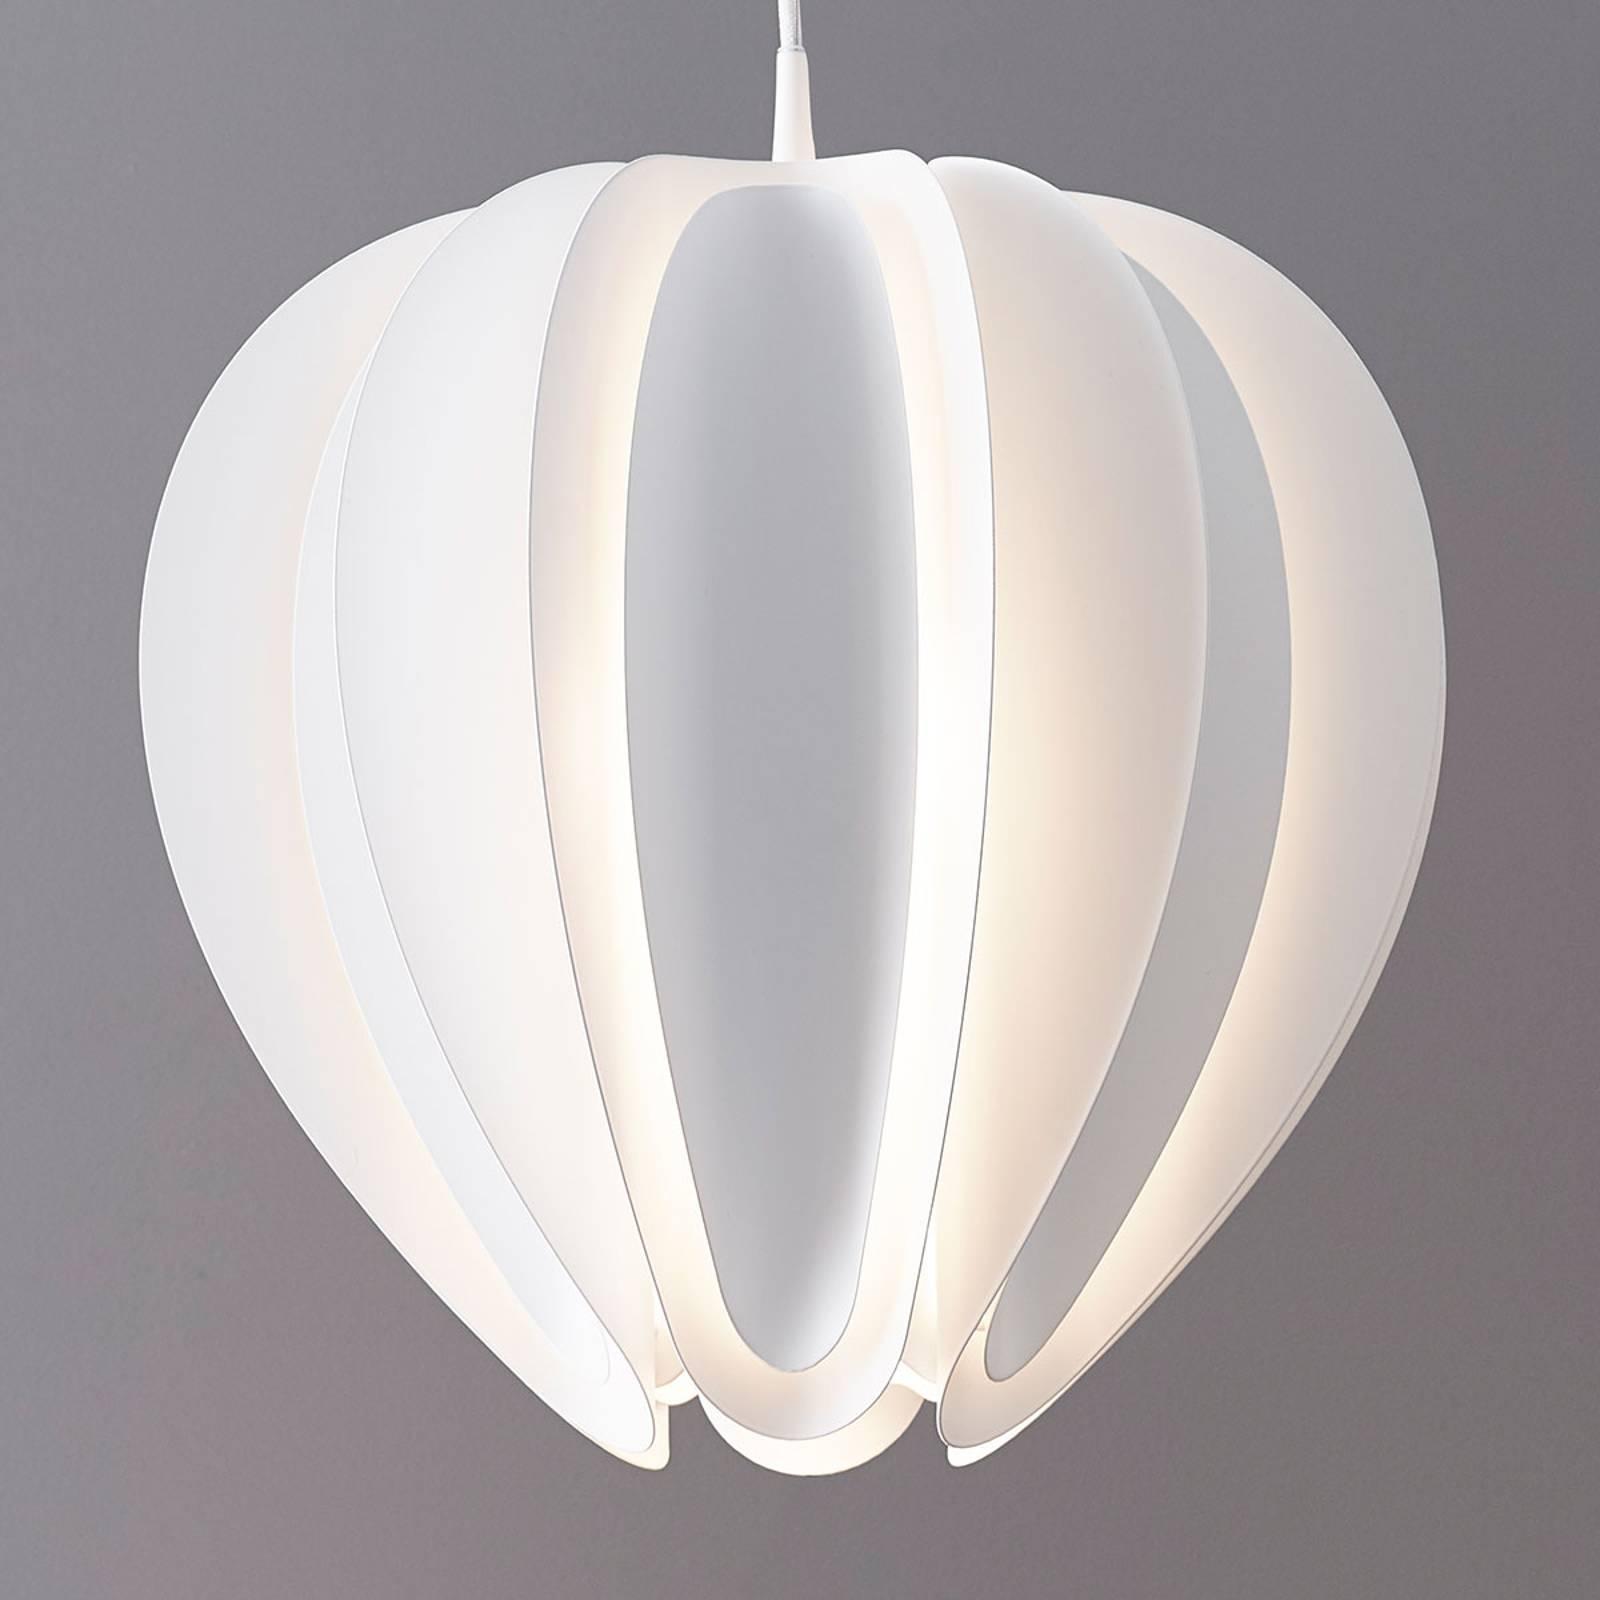 Hanglamp Tulip